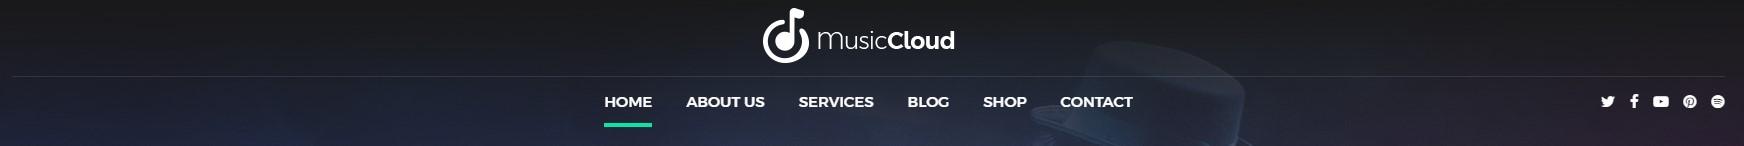 https://documentation.bold-themes.com/music-club/wp-content/uploads/sites/19/2017/06/menu-below-center.jpg